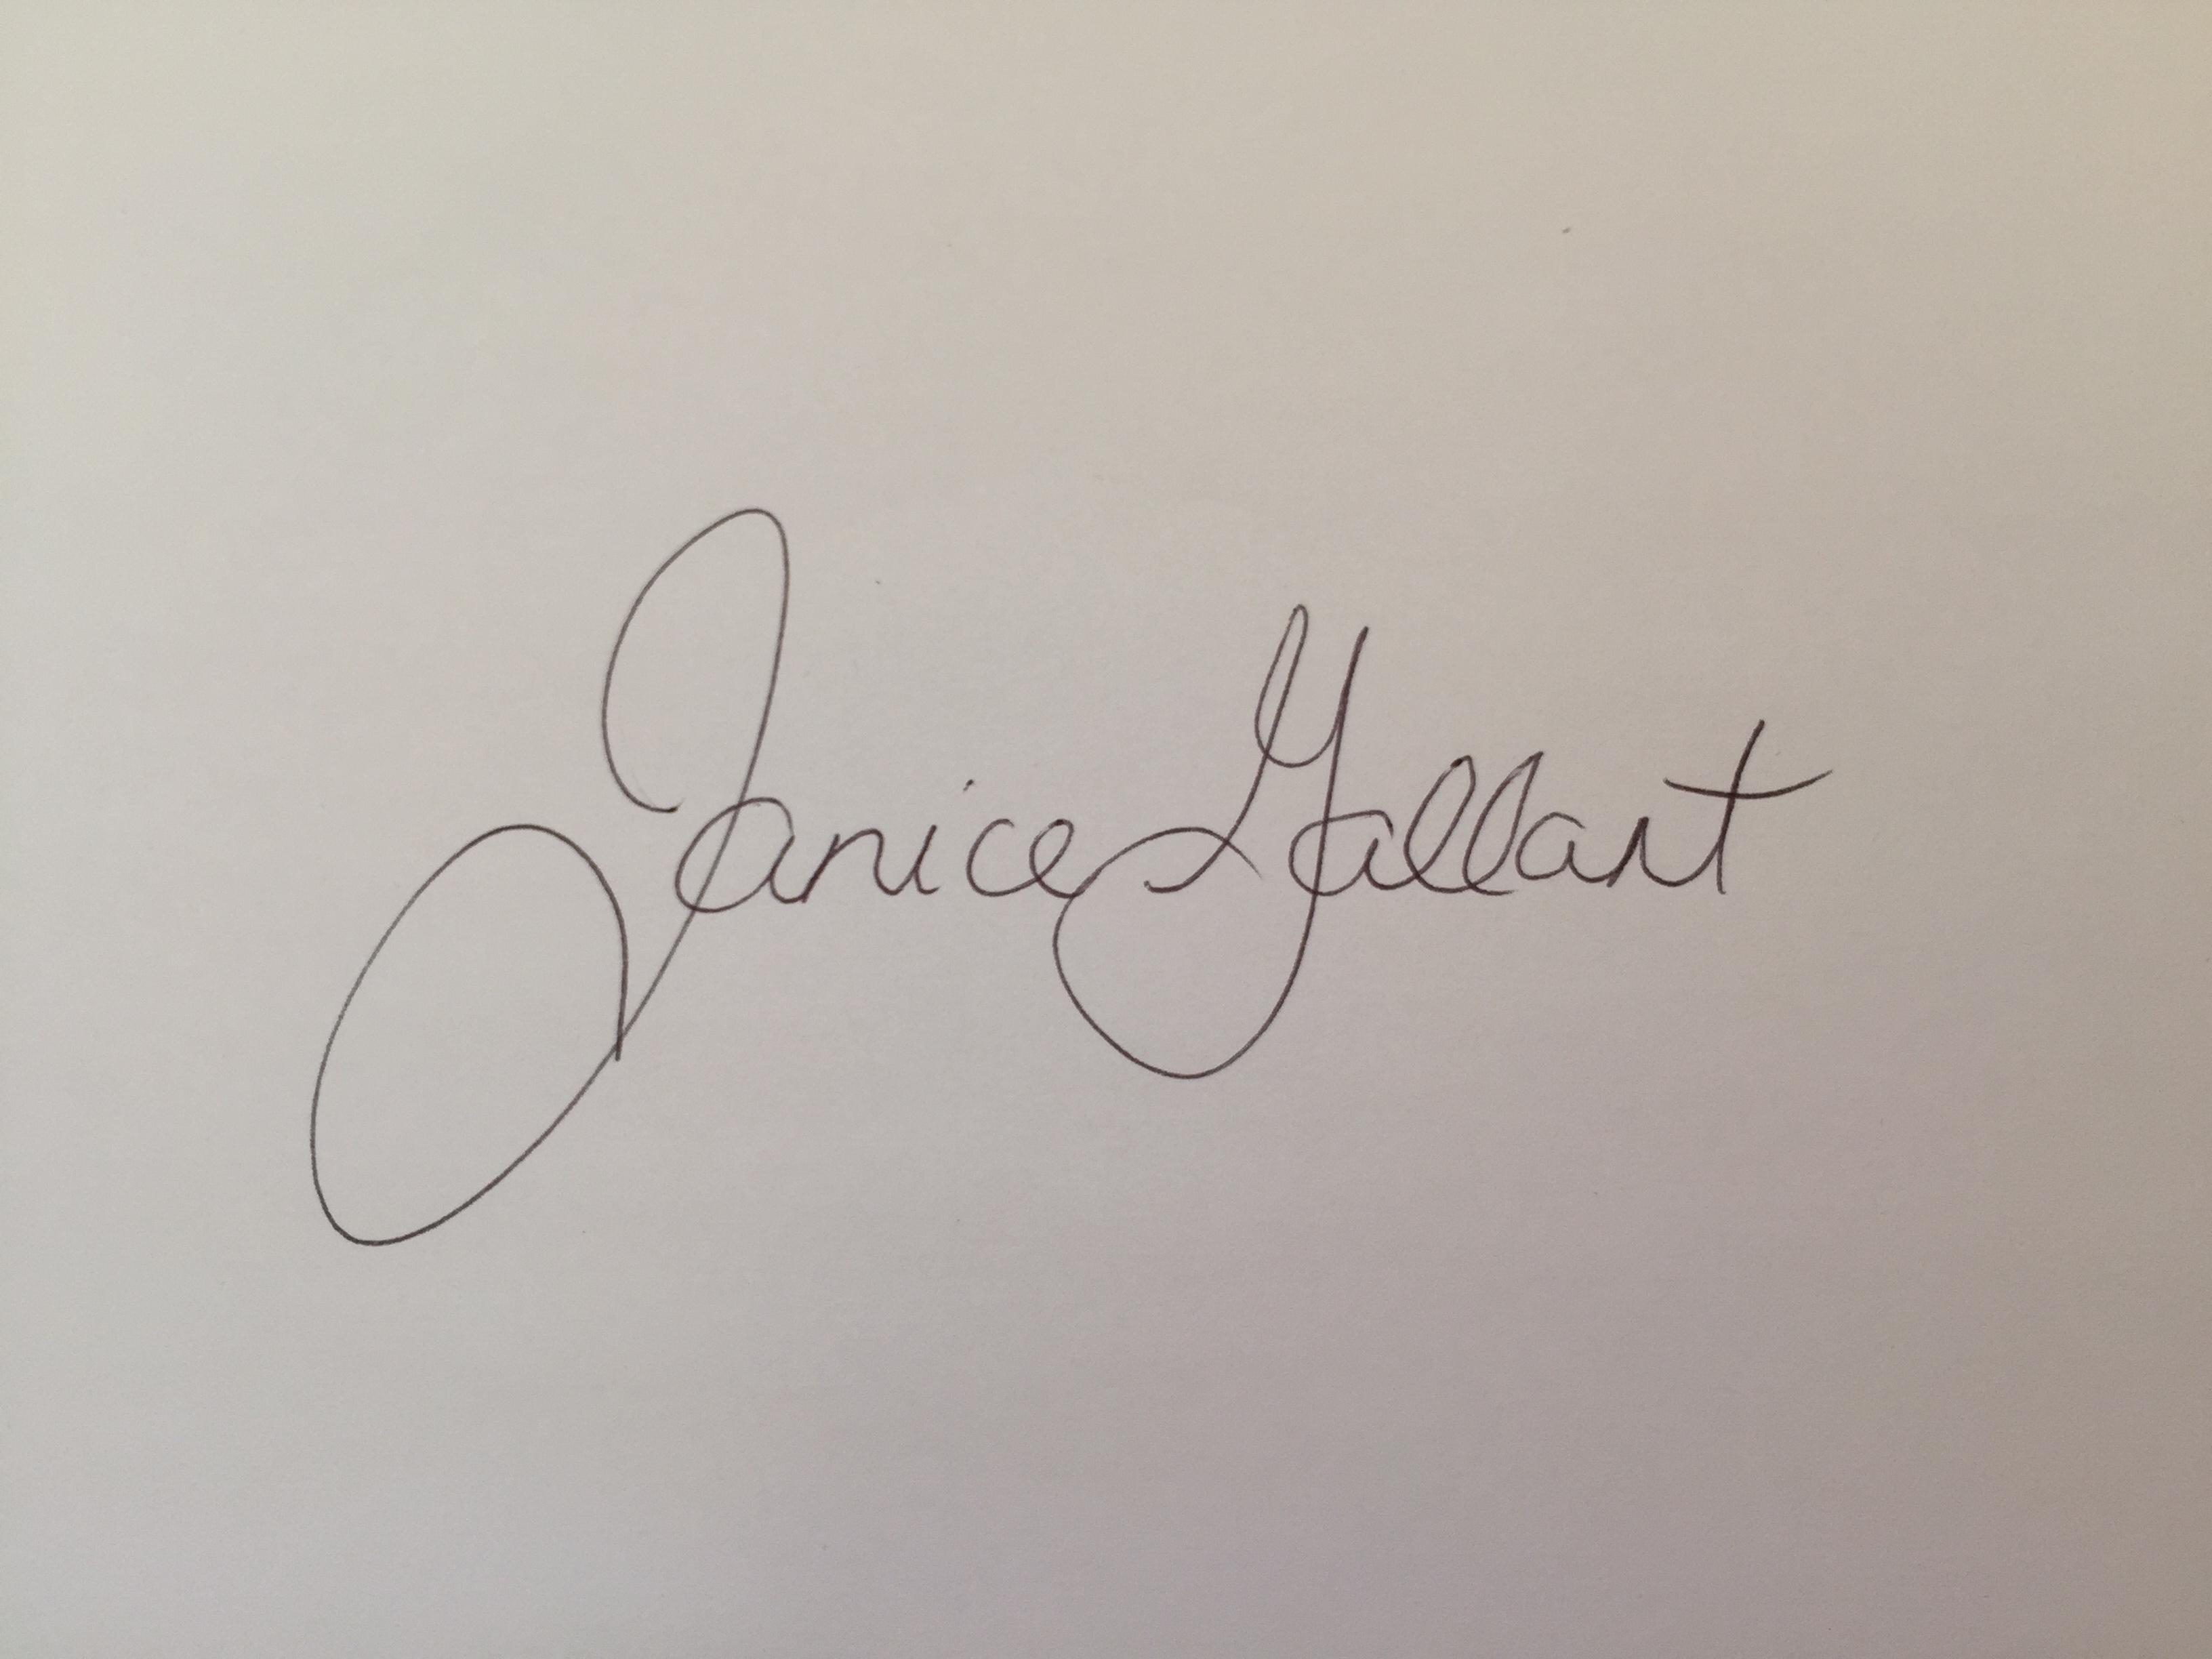 Janice Gallant's Signature